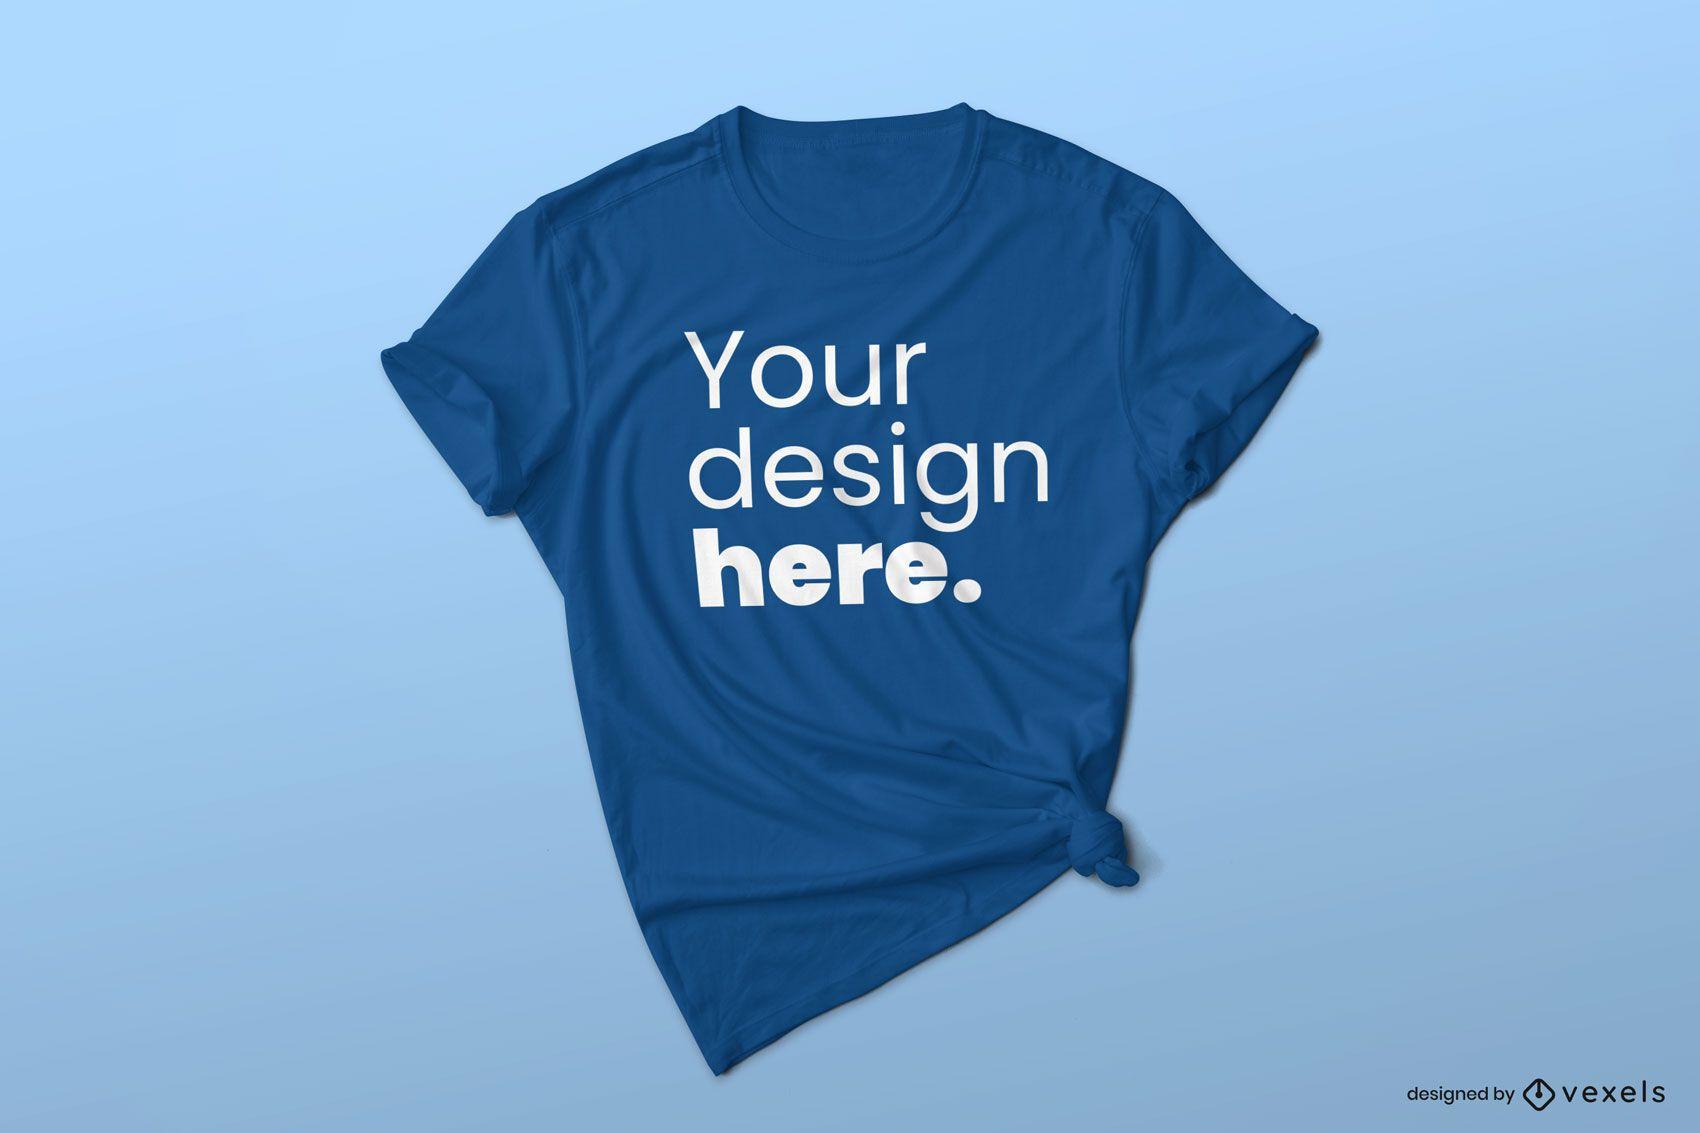 Tied t-shirt mockup design